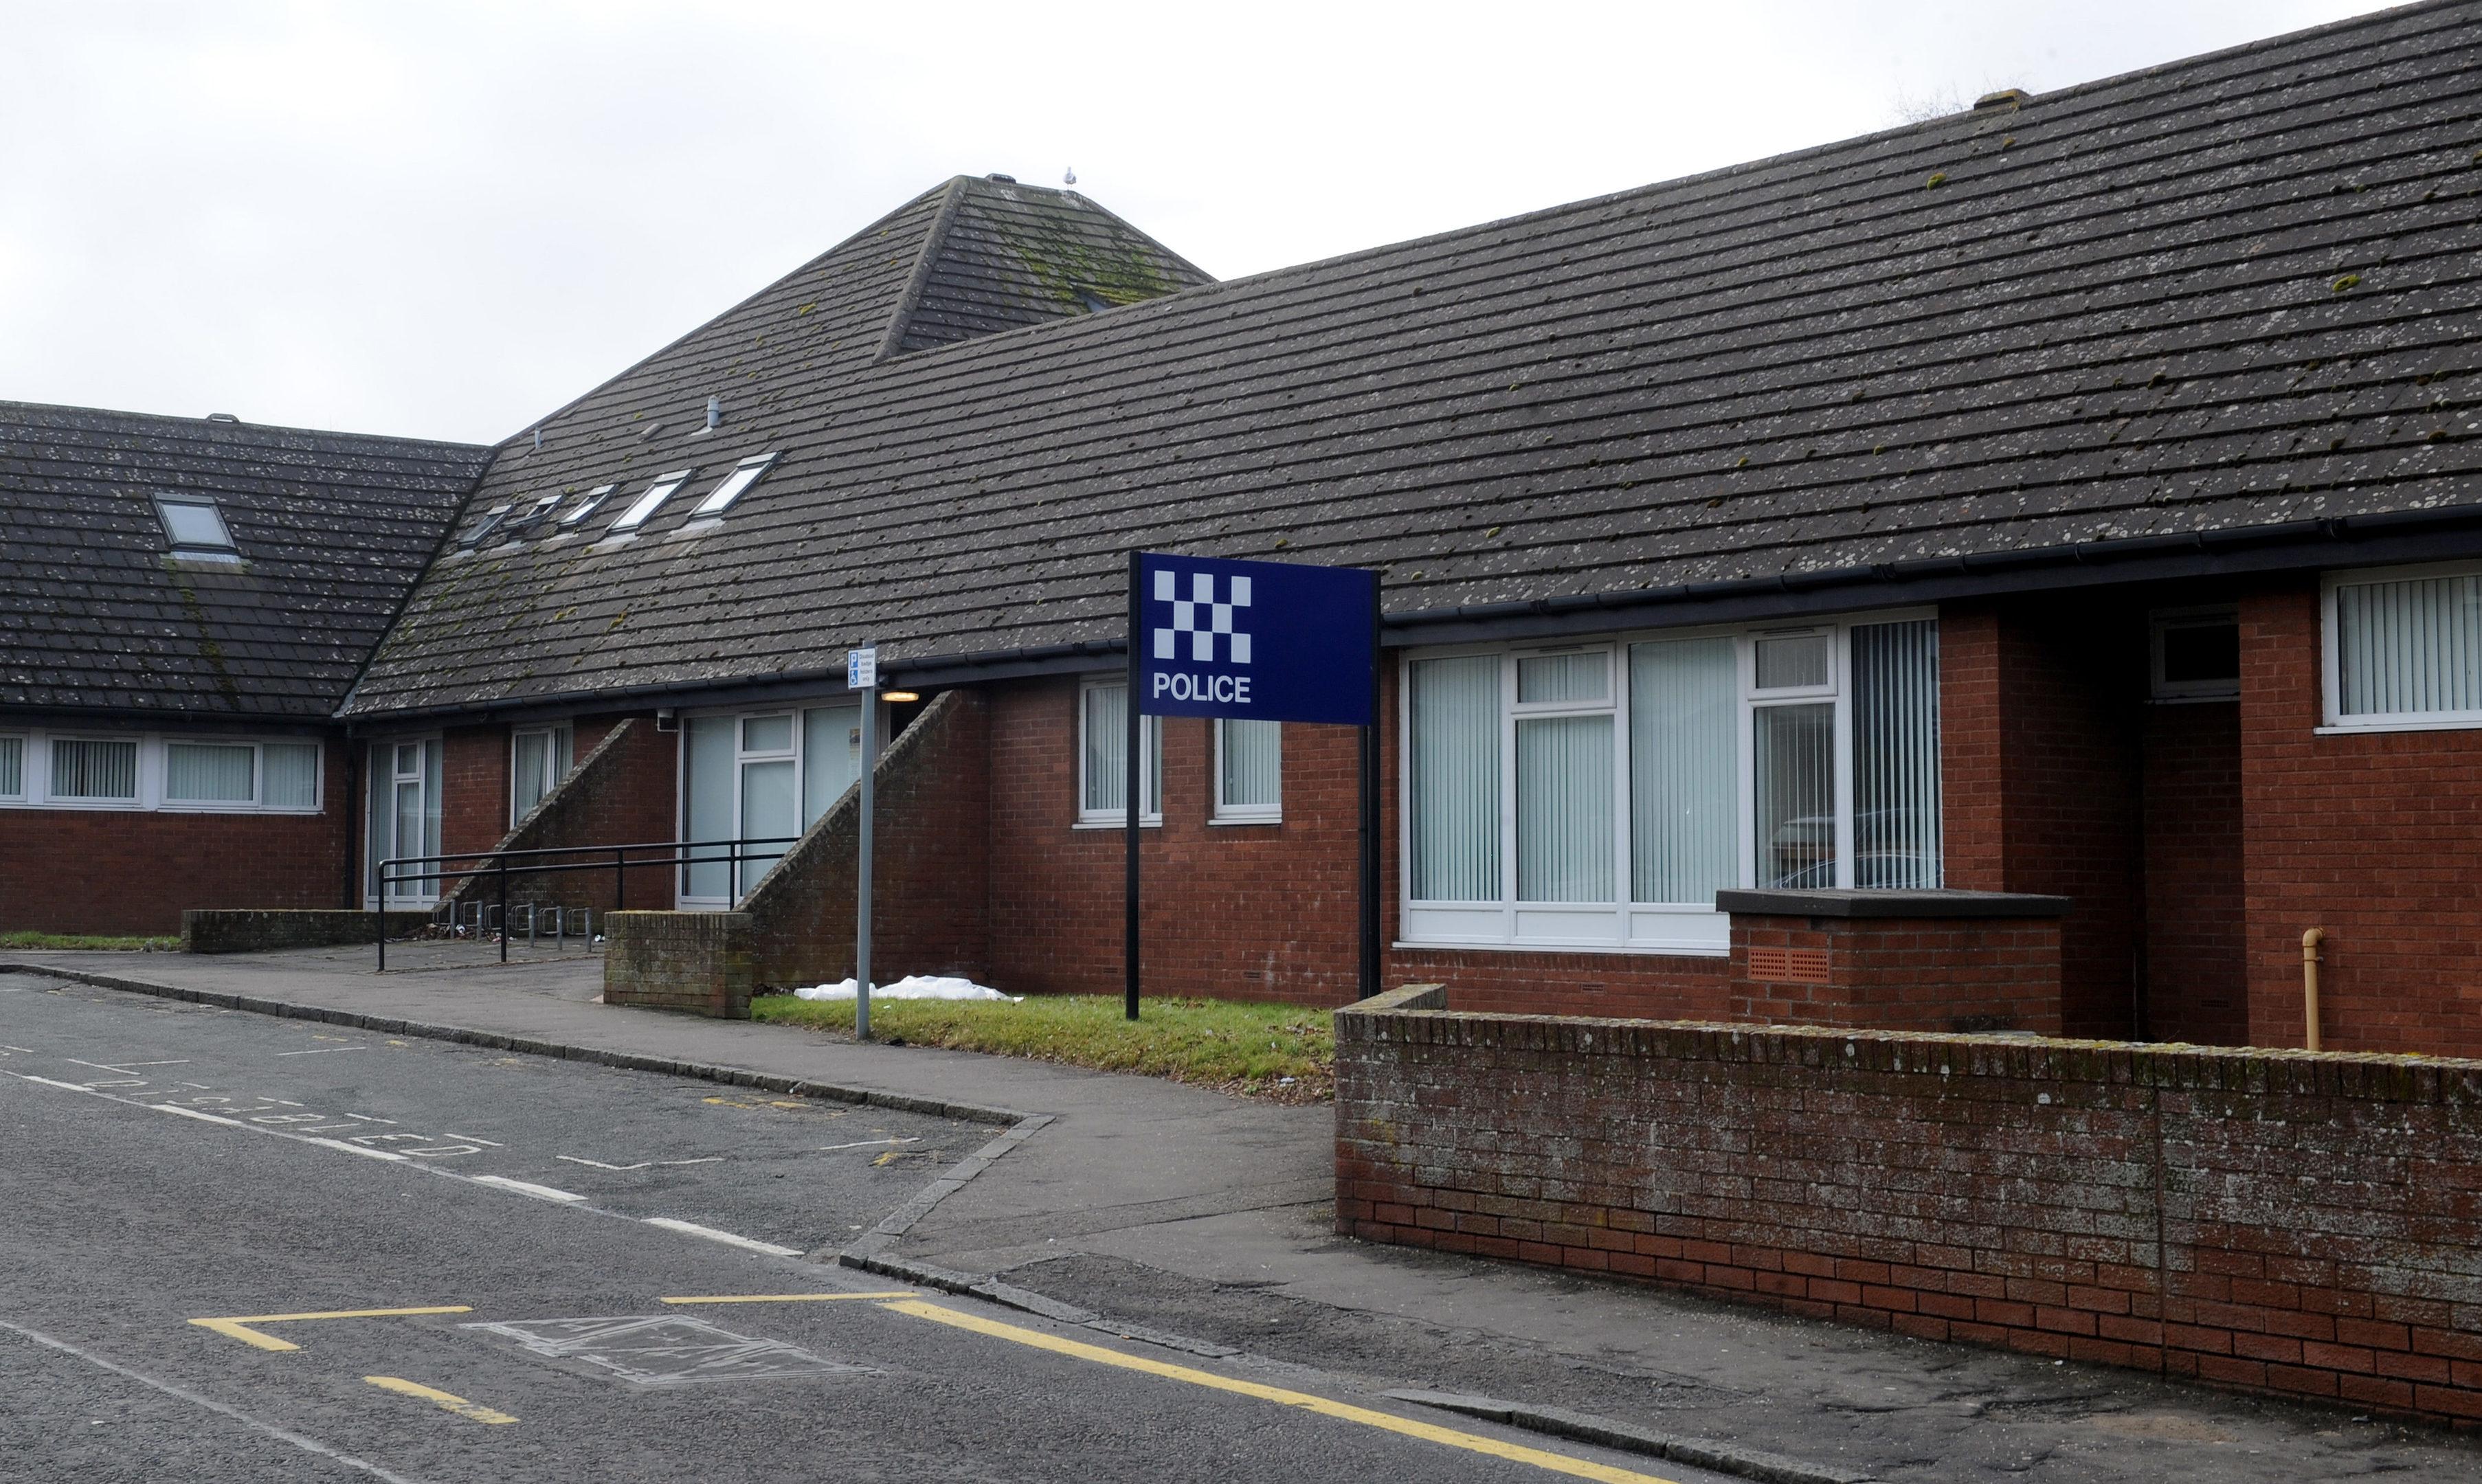 The St Andrews station